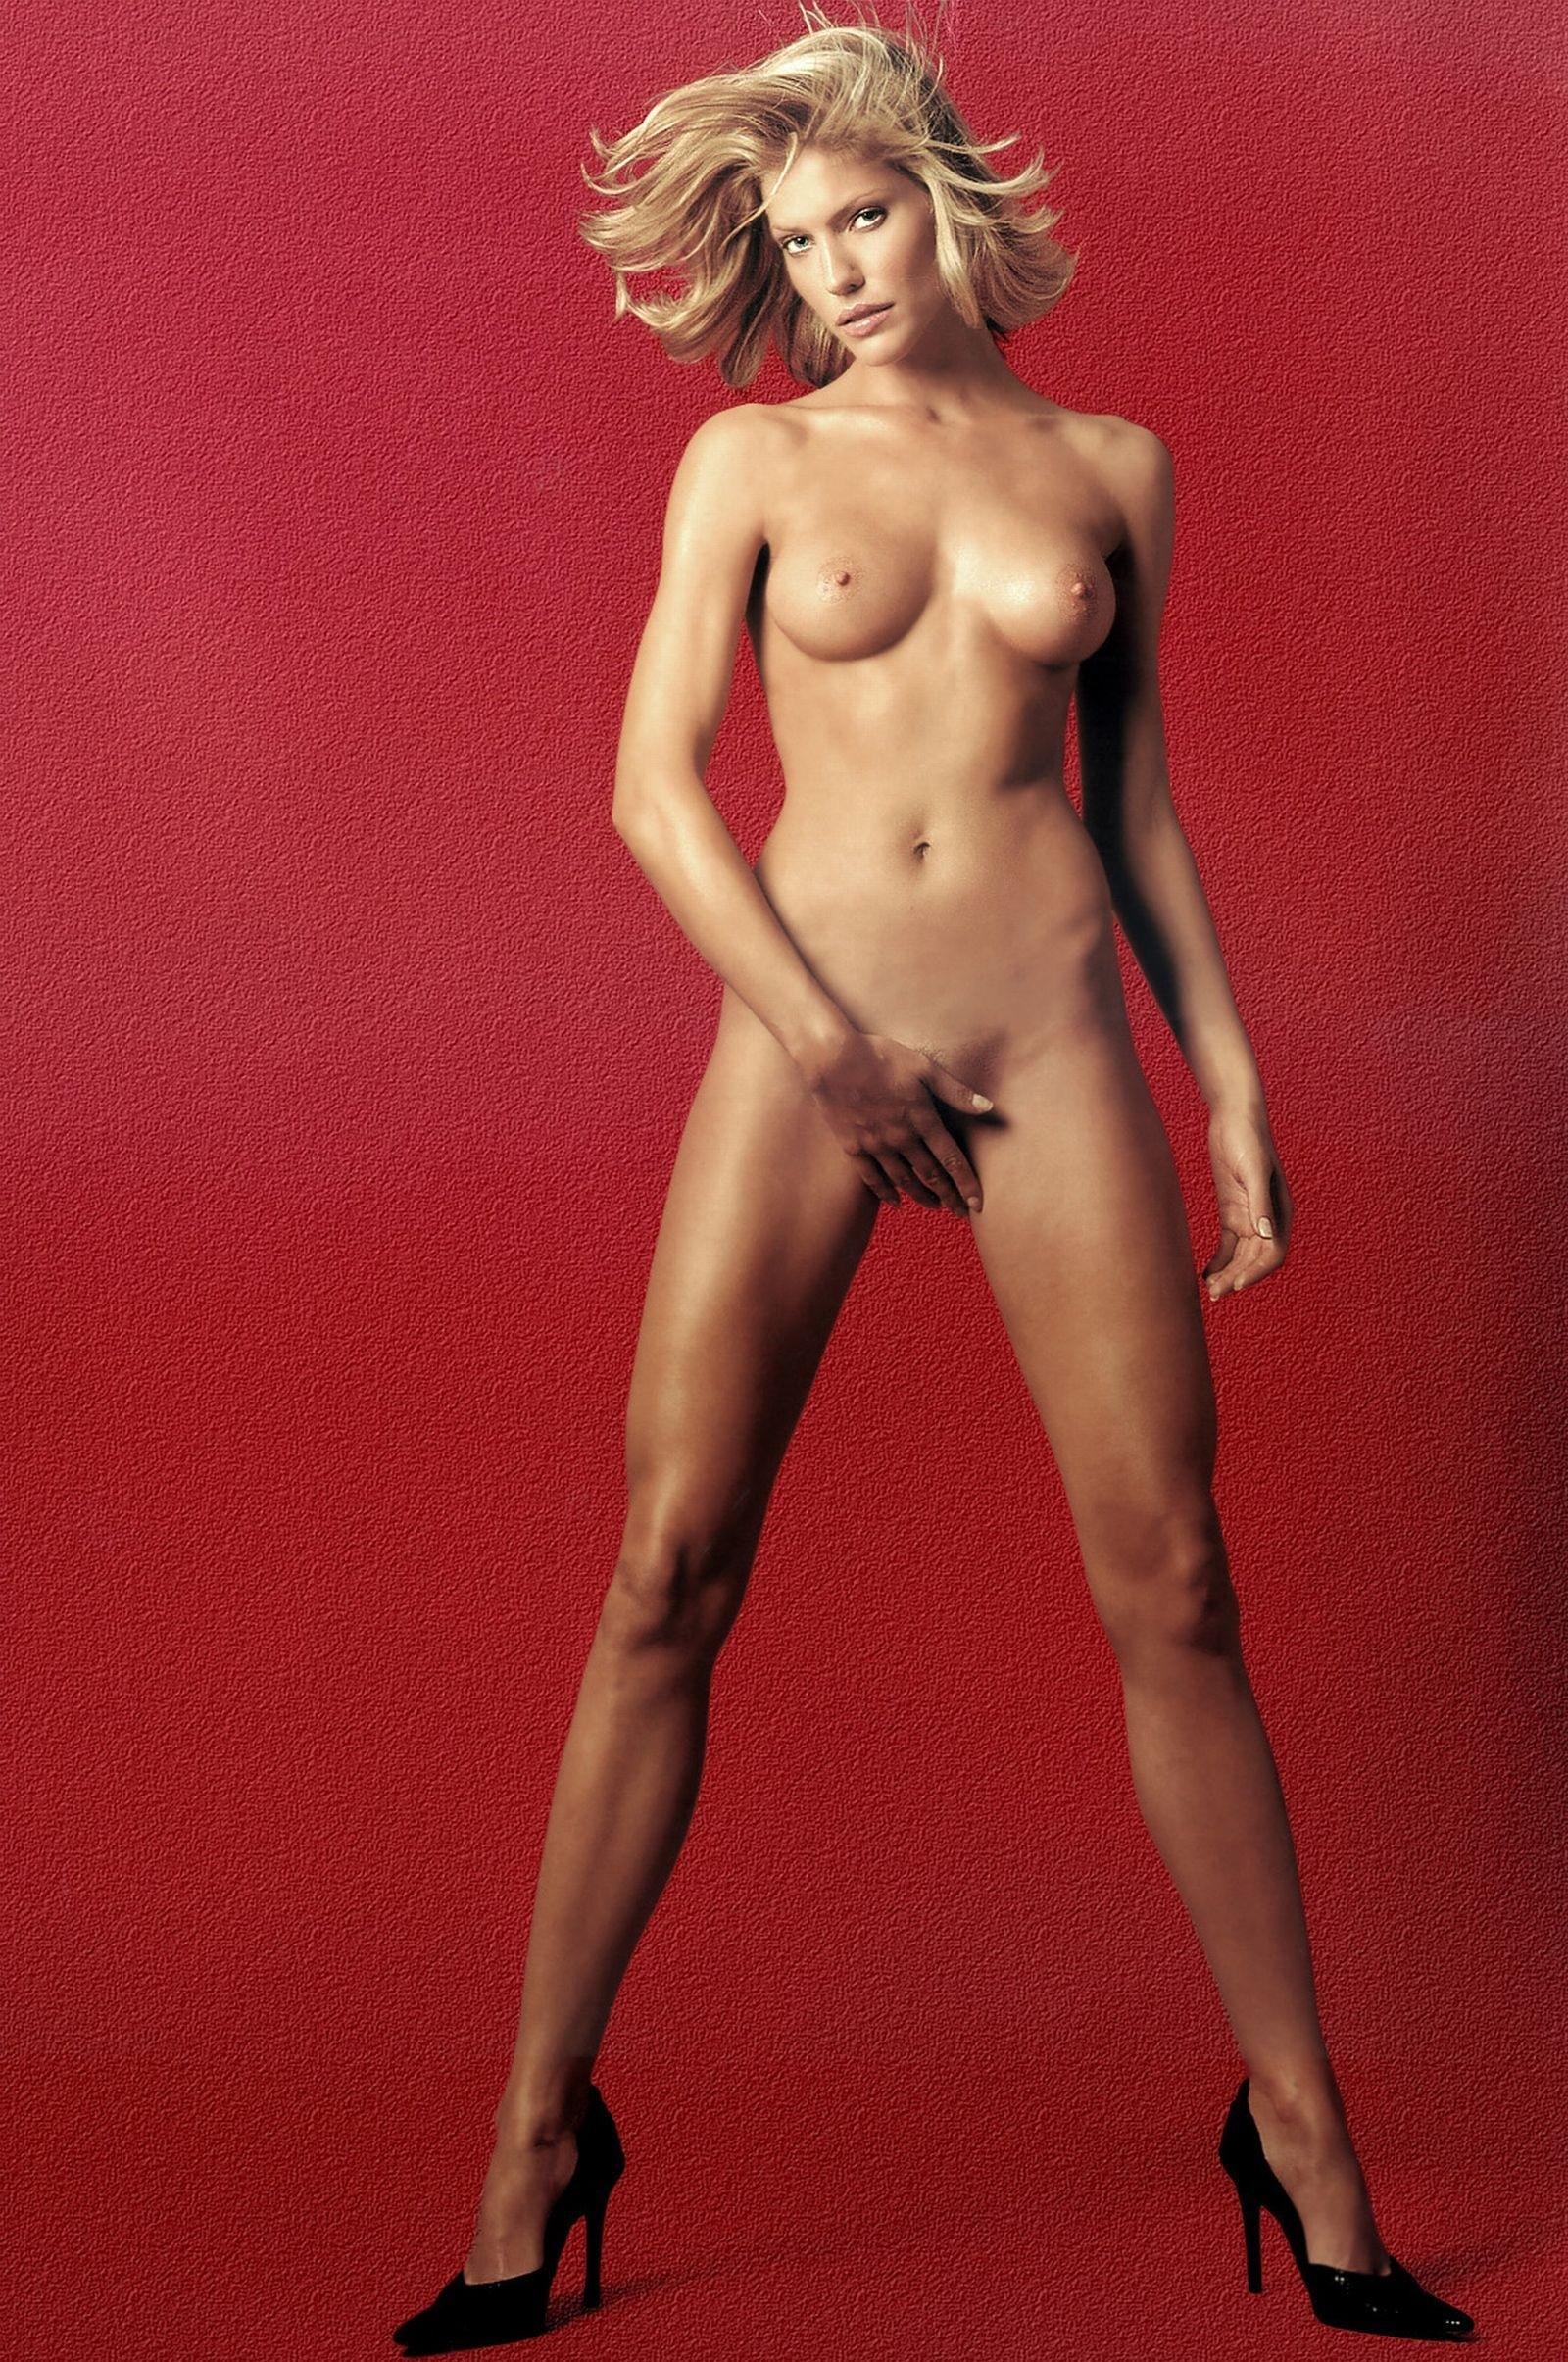 Tricia helfer nude cummed on — photo 4